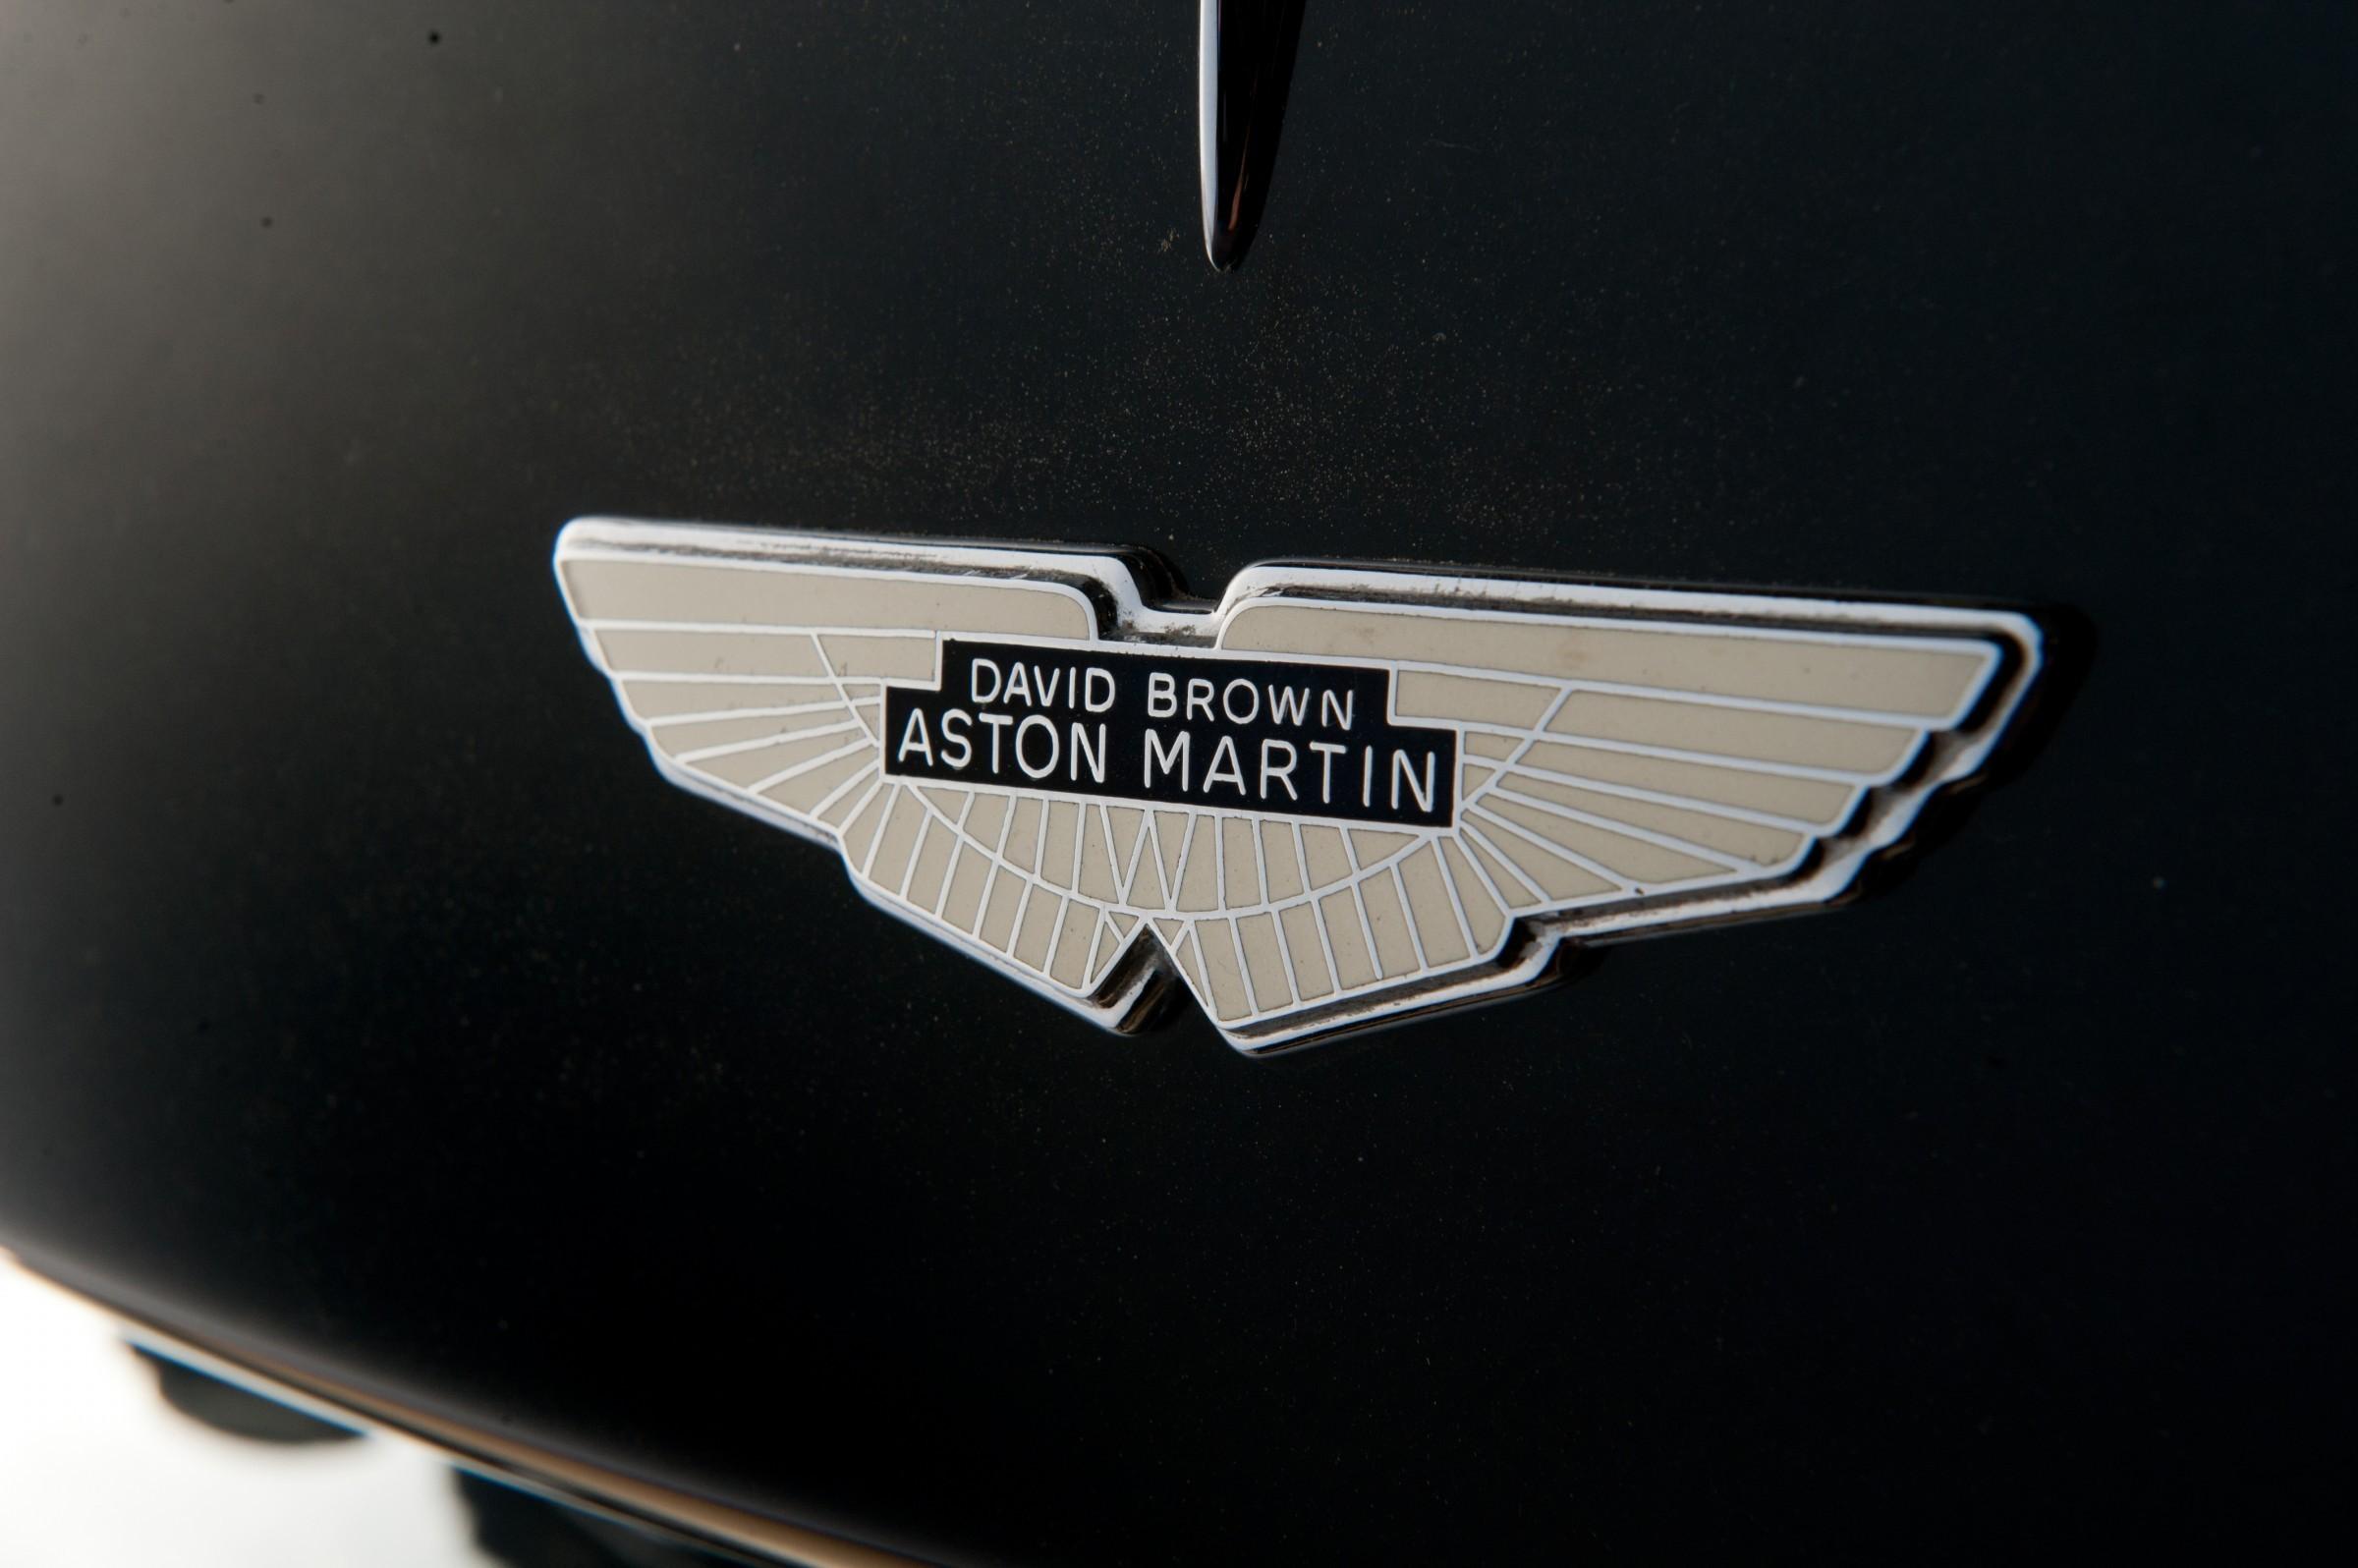 Aston Martin Logo Wallpapers 55 Images